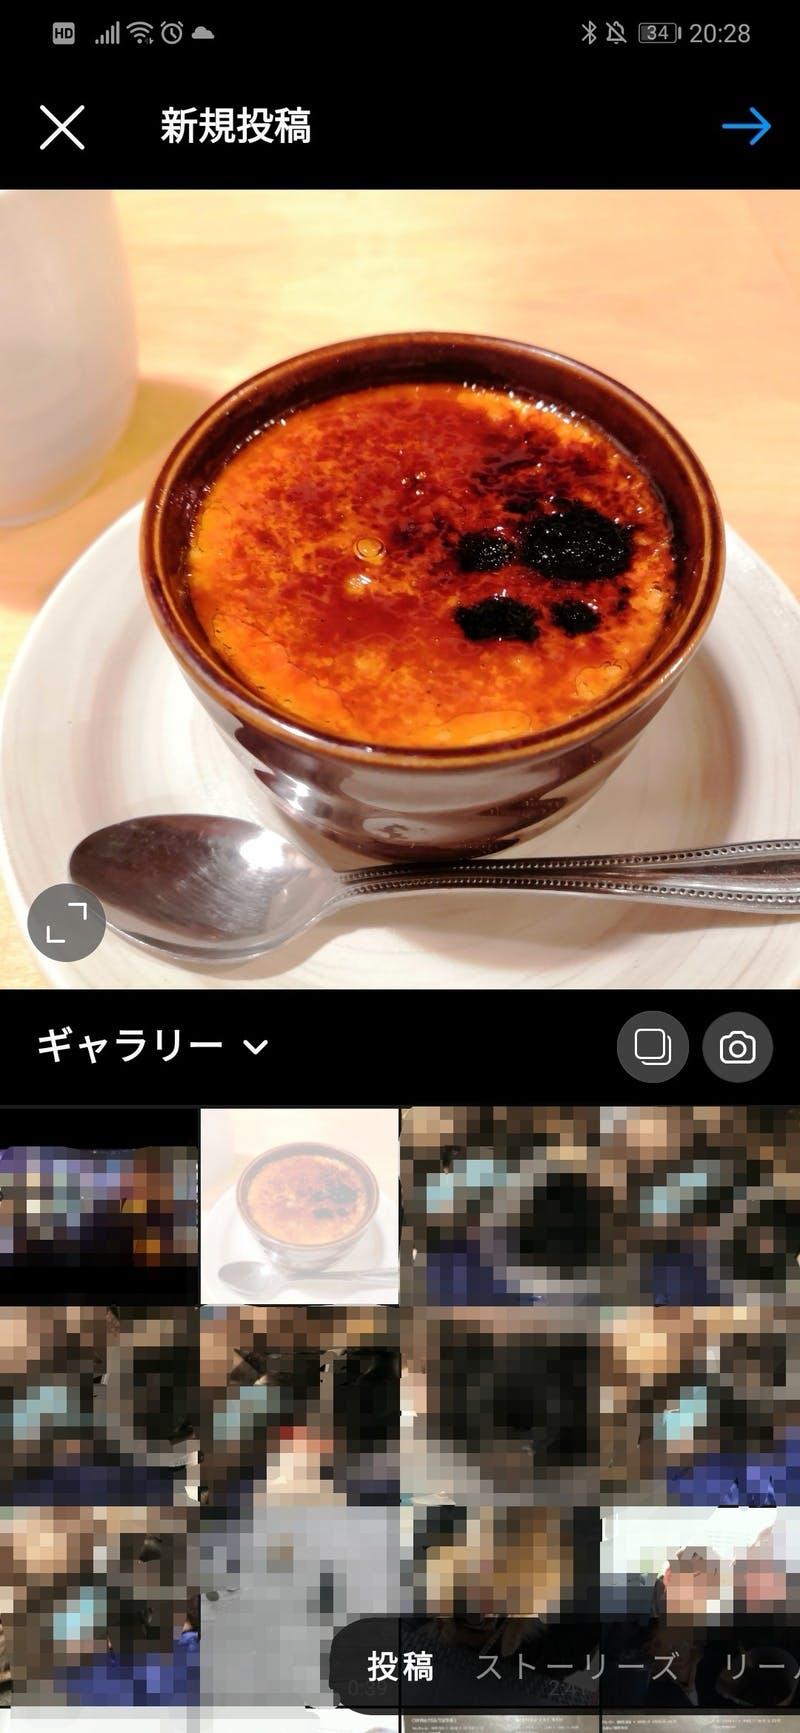 Instagram 投稿 店舗 位置情報 載せる 方法